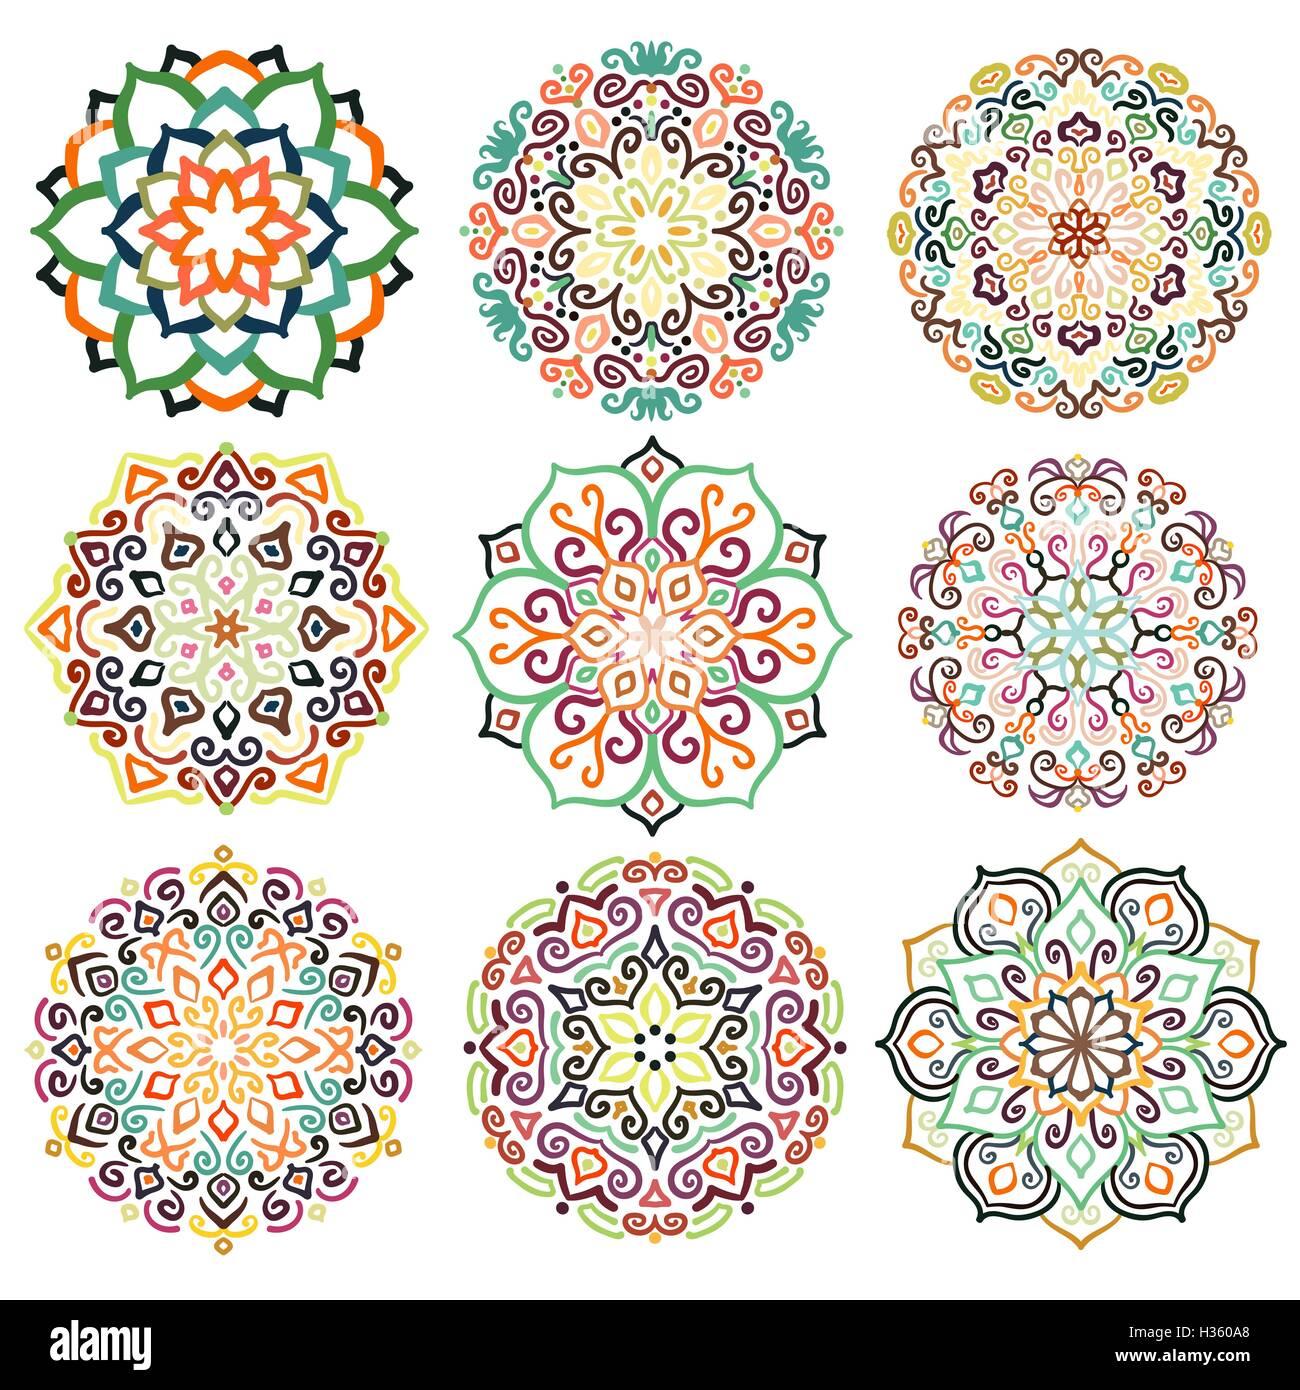 Flower Round Ornament Mandala Set - Stock Image